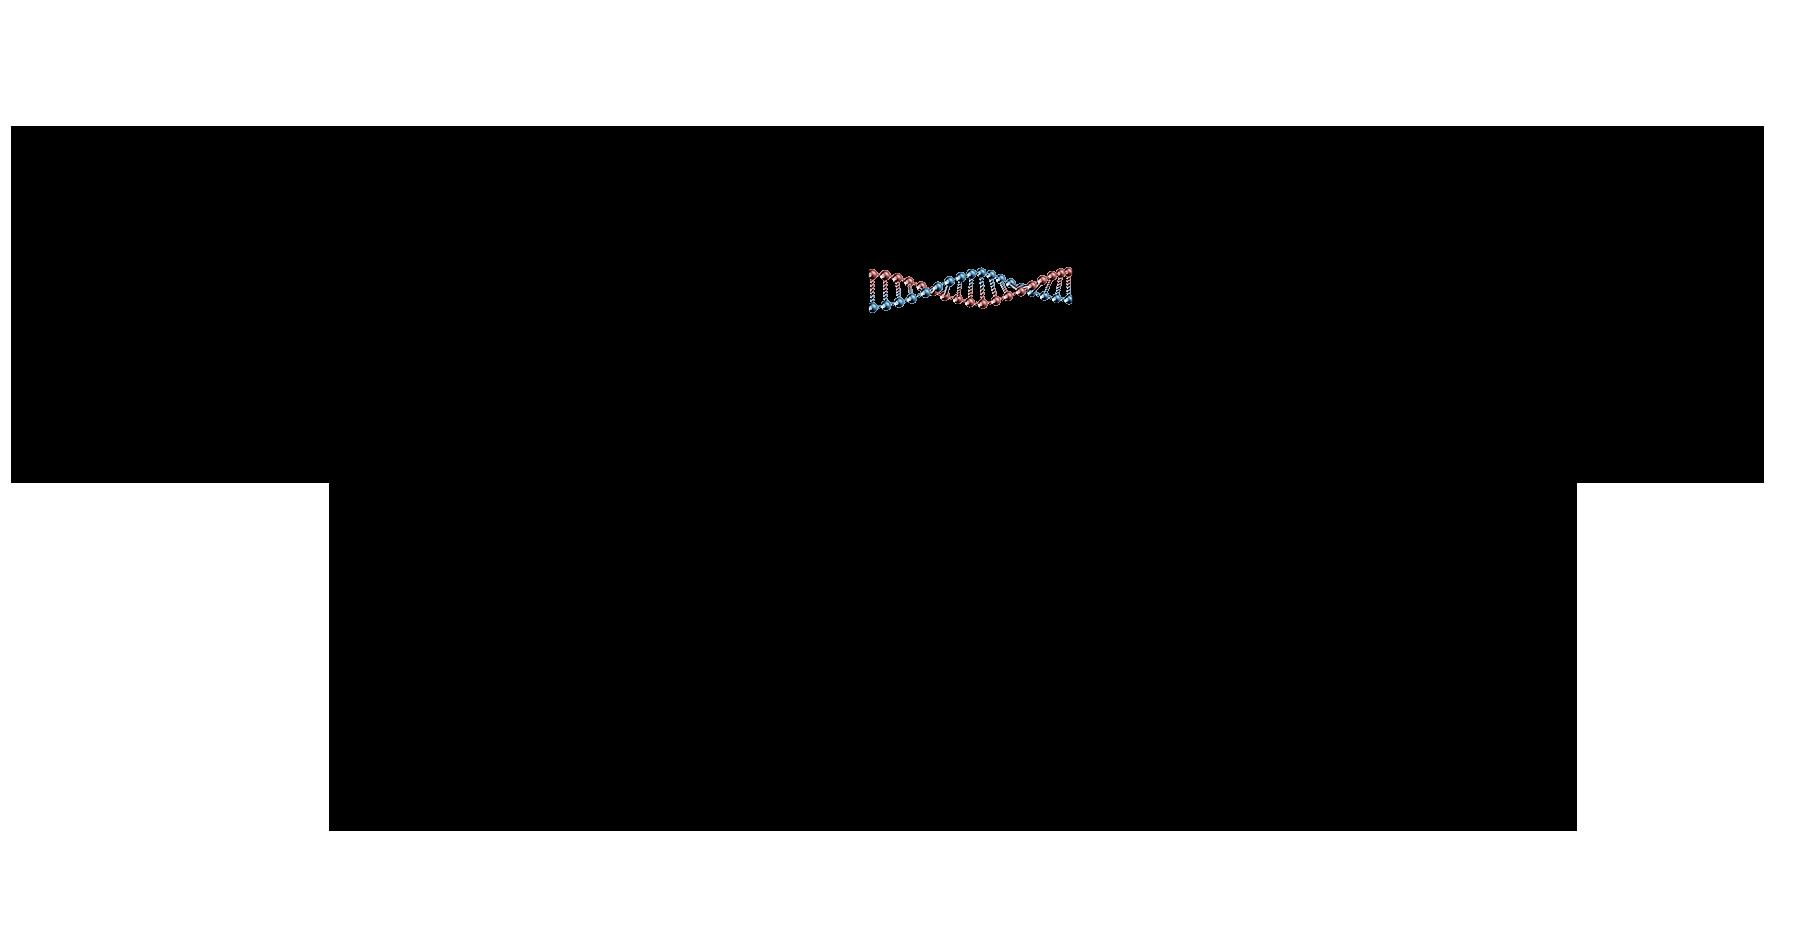 Orphan-Black_logo.png